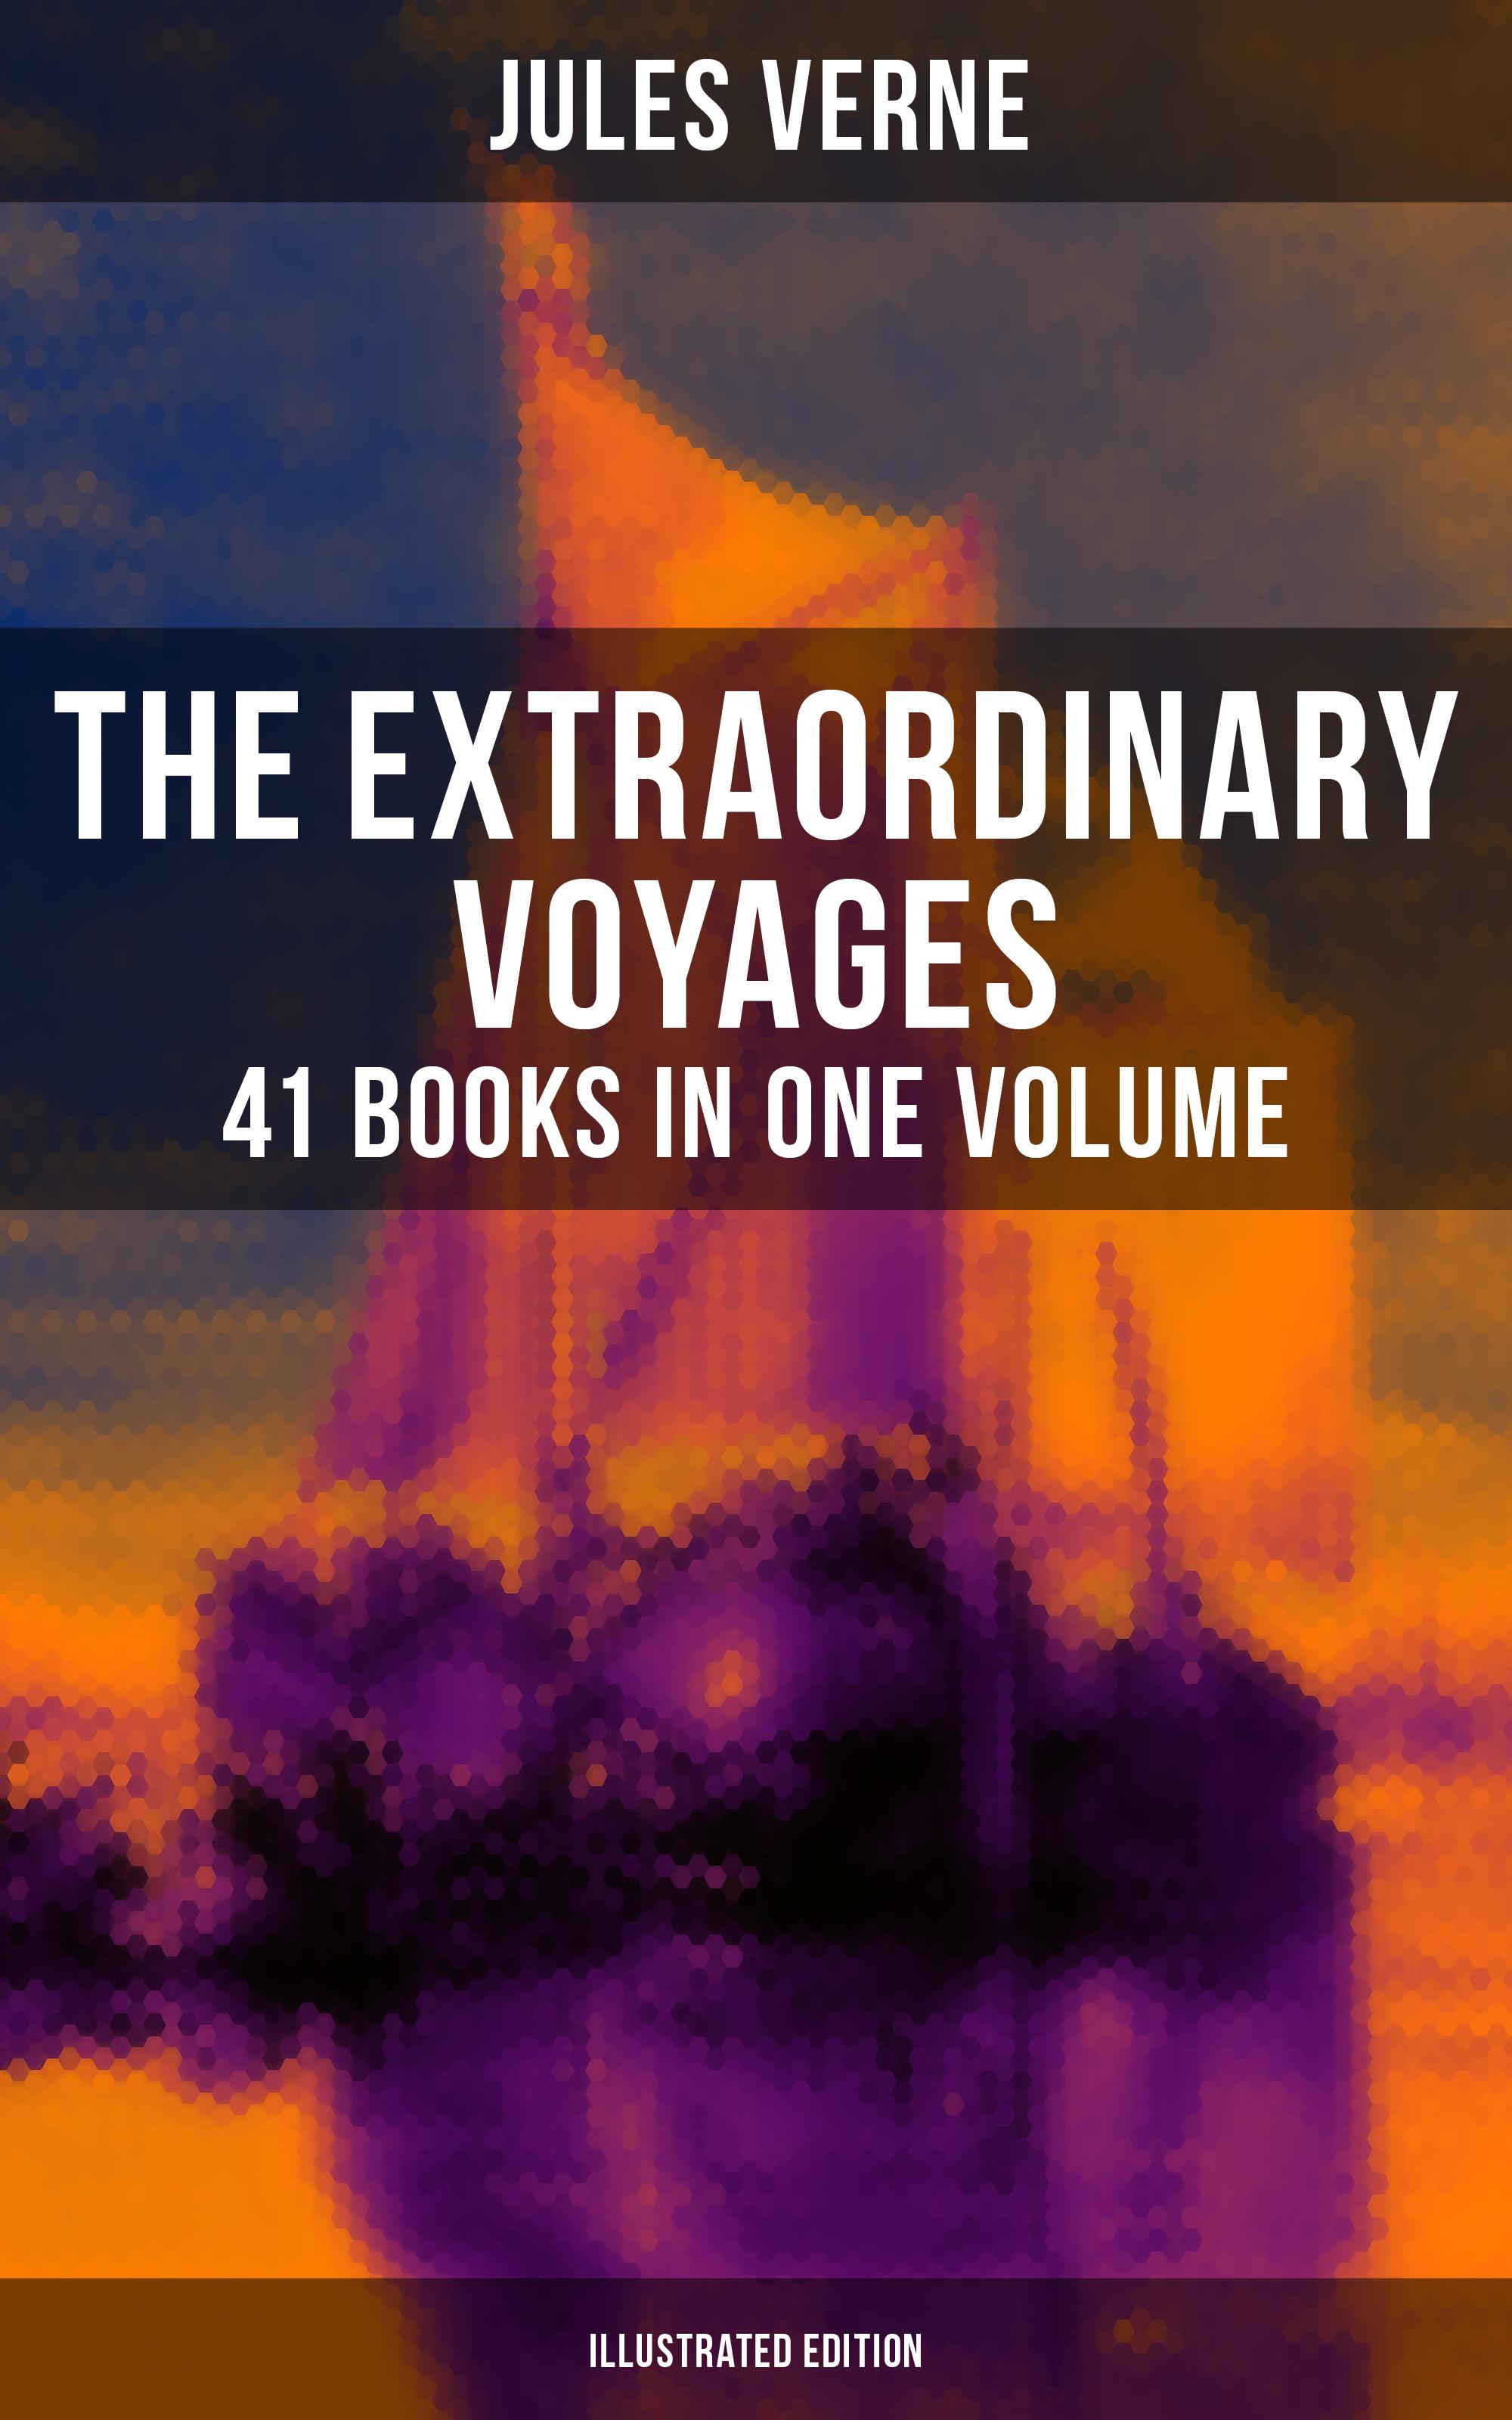 Жюль Верн The Extraordinary Voyages: 41 Books in One Volume (Illustrated Edition) pliny c plini secundi naturalis historiae libri xxxvii volume 3 books 16 22 italian edition